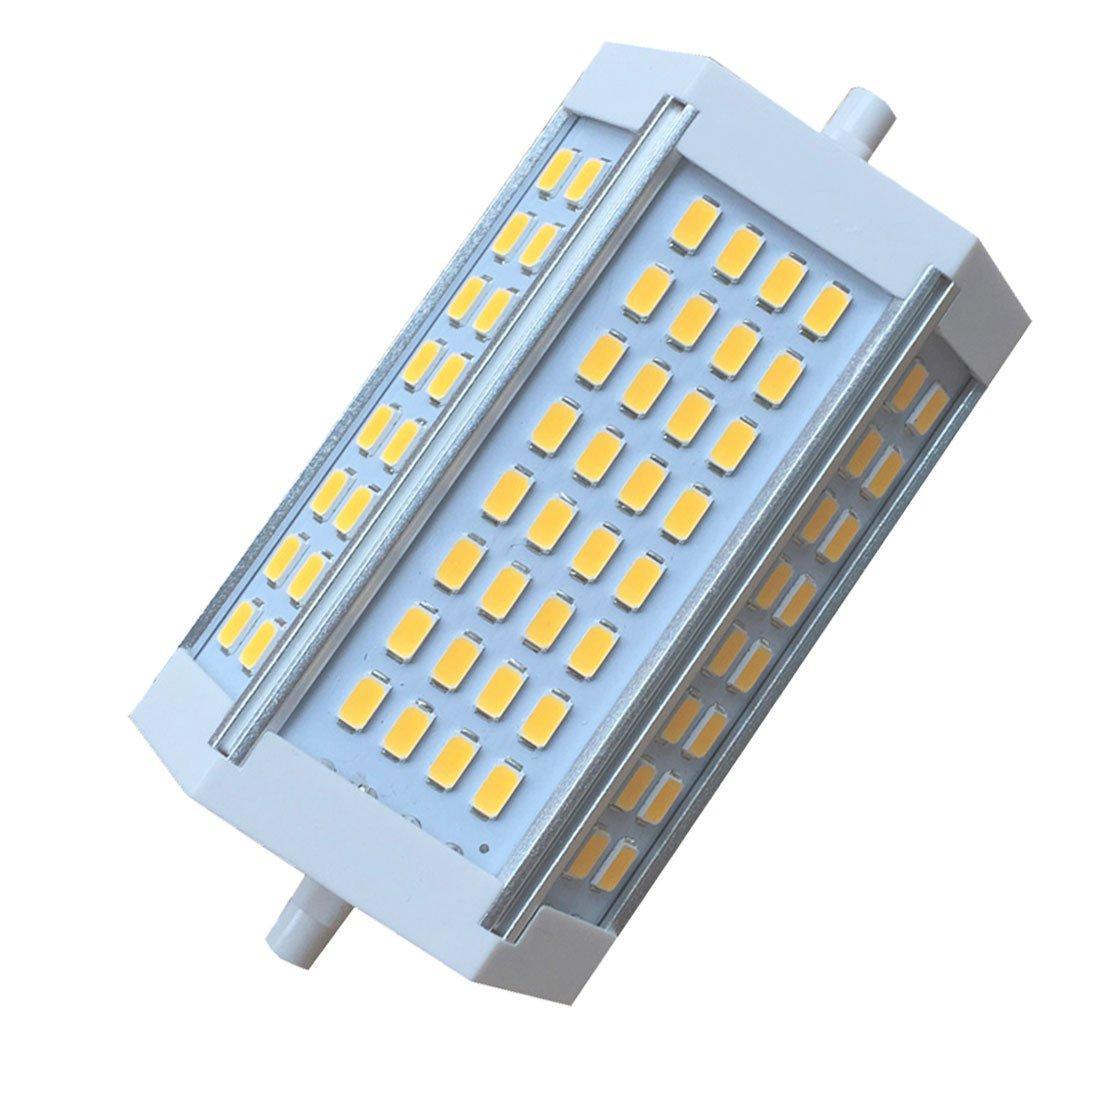 ohne L/üfter Bonlux 30W Dimmbare R7s Linear LED Tube 118mm K/ühl Wei/ß 6000K 200 Degrees Super Bright J Typ J118 R7s Scheinwerfer-Birnen-250W Halogen-Ersatz LED